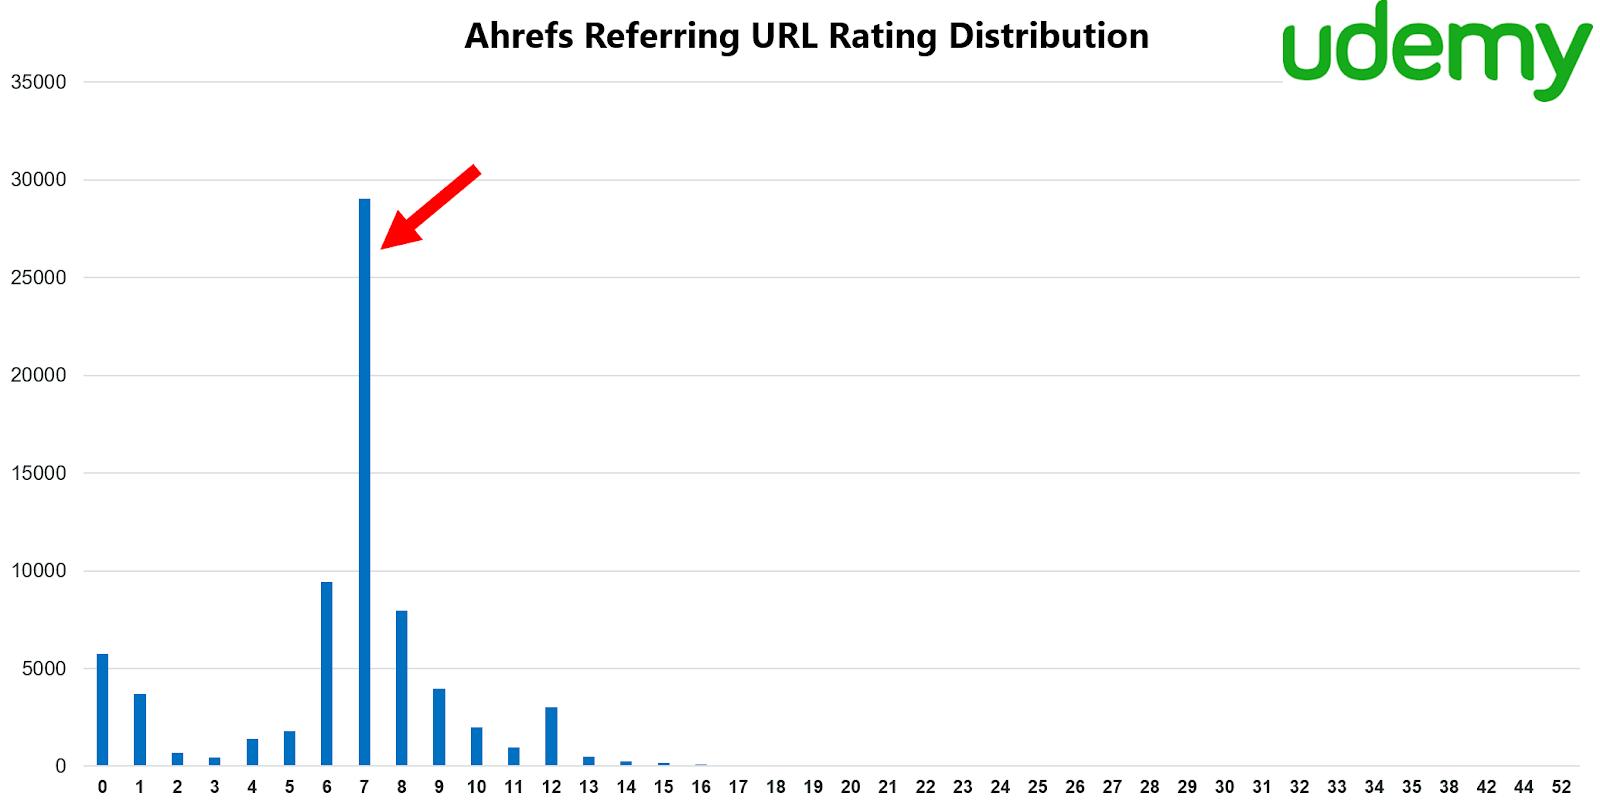 Ahrefs Referring URL Rating Distribution - Udemy